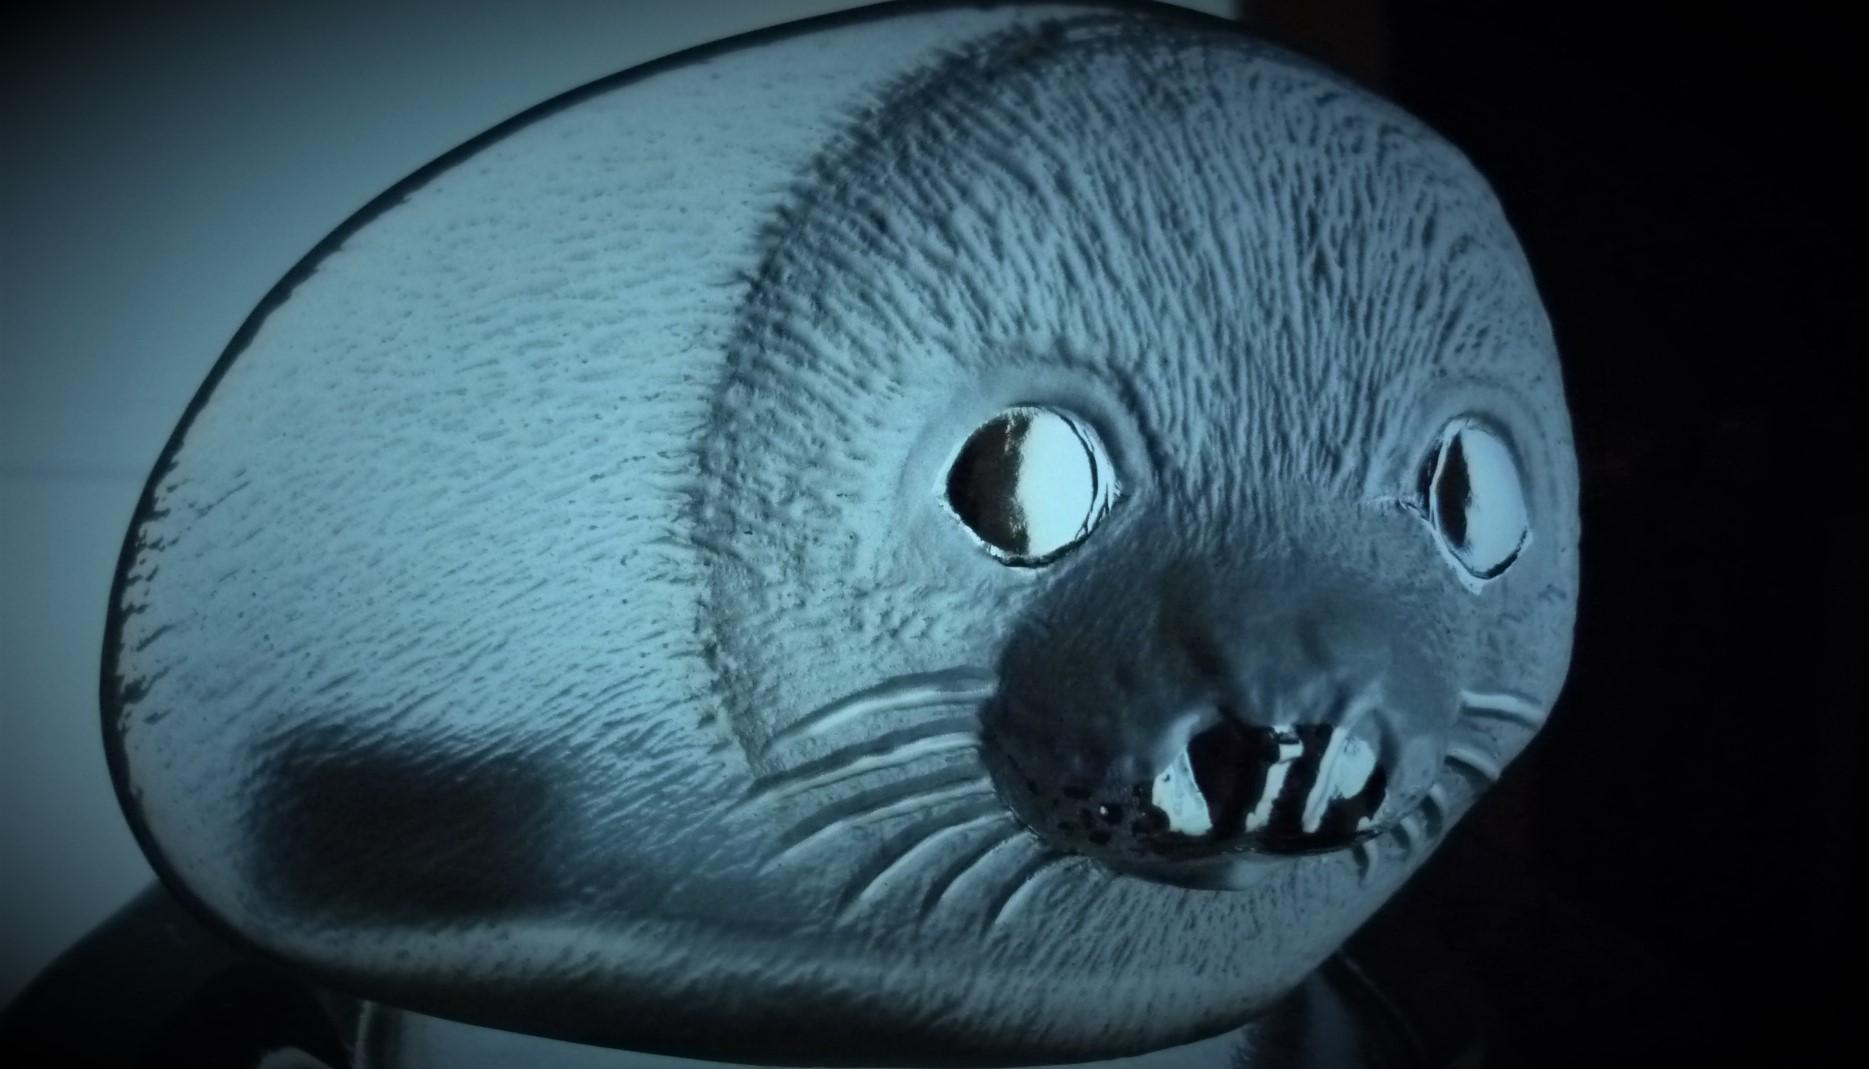 Mats Jonasson signature Collection Baby Seal figurine